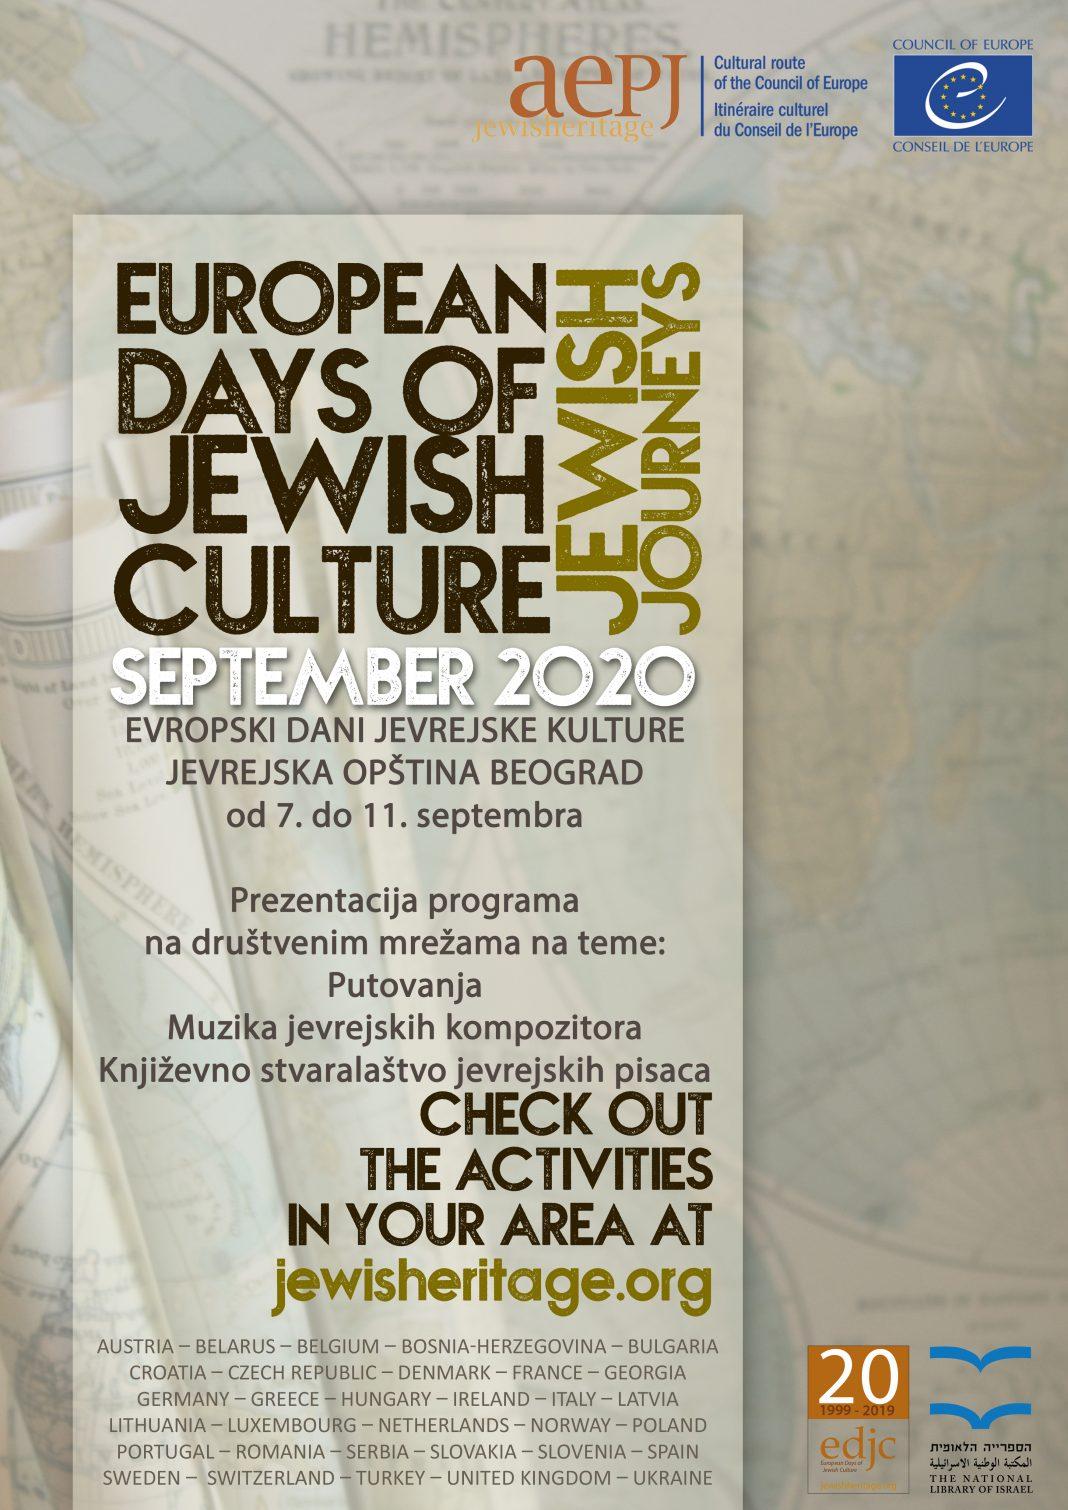 Jevrejska opština Beograd - Evropski dani jevrejske kulture 2020